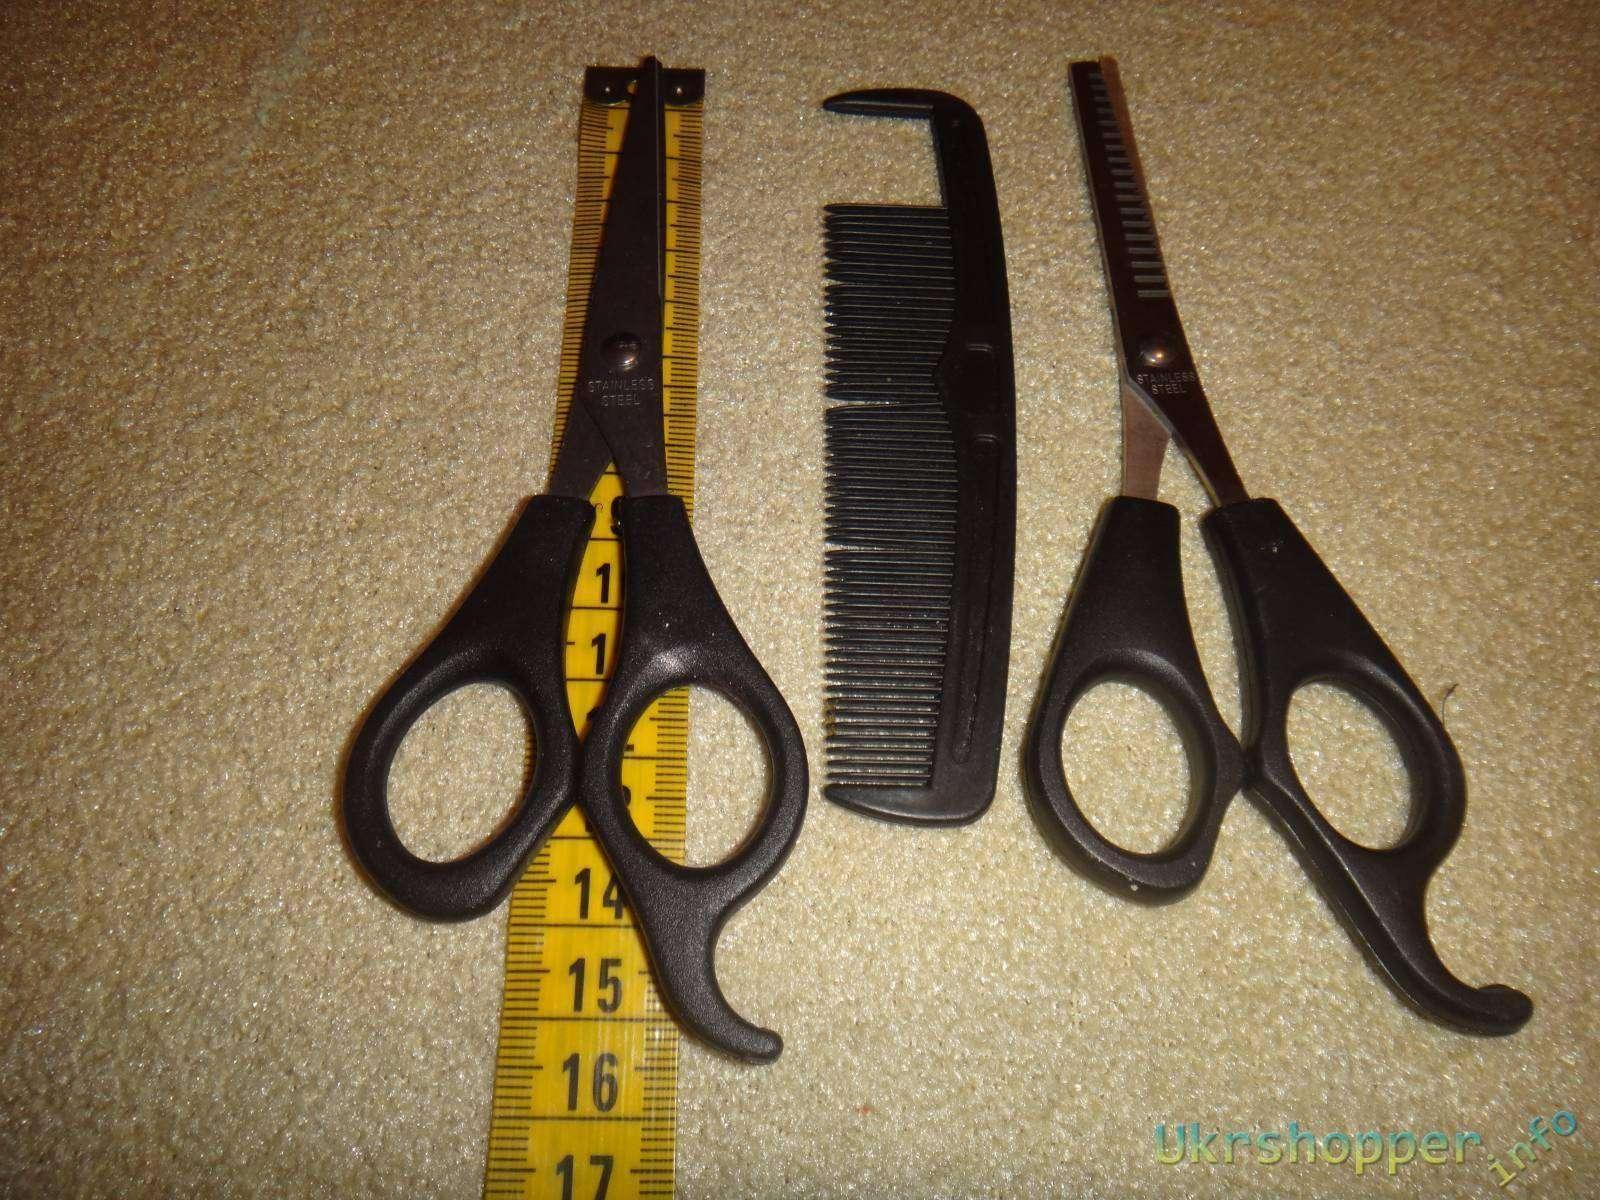 BuyinCoins: Обзор набора из двух ножниц и расчески